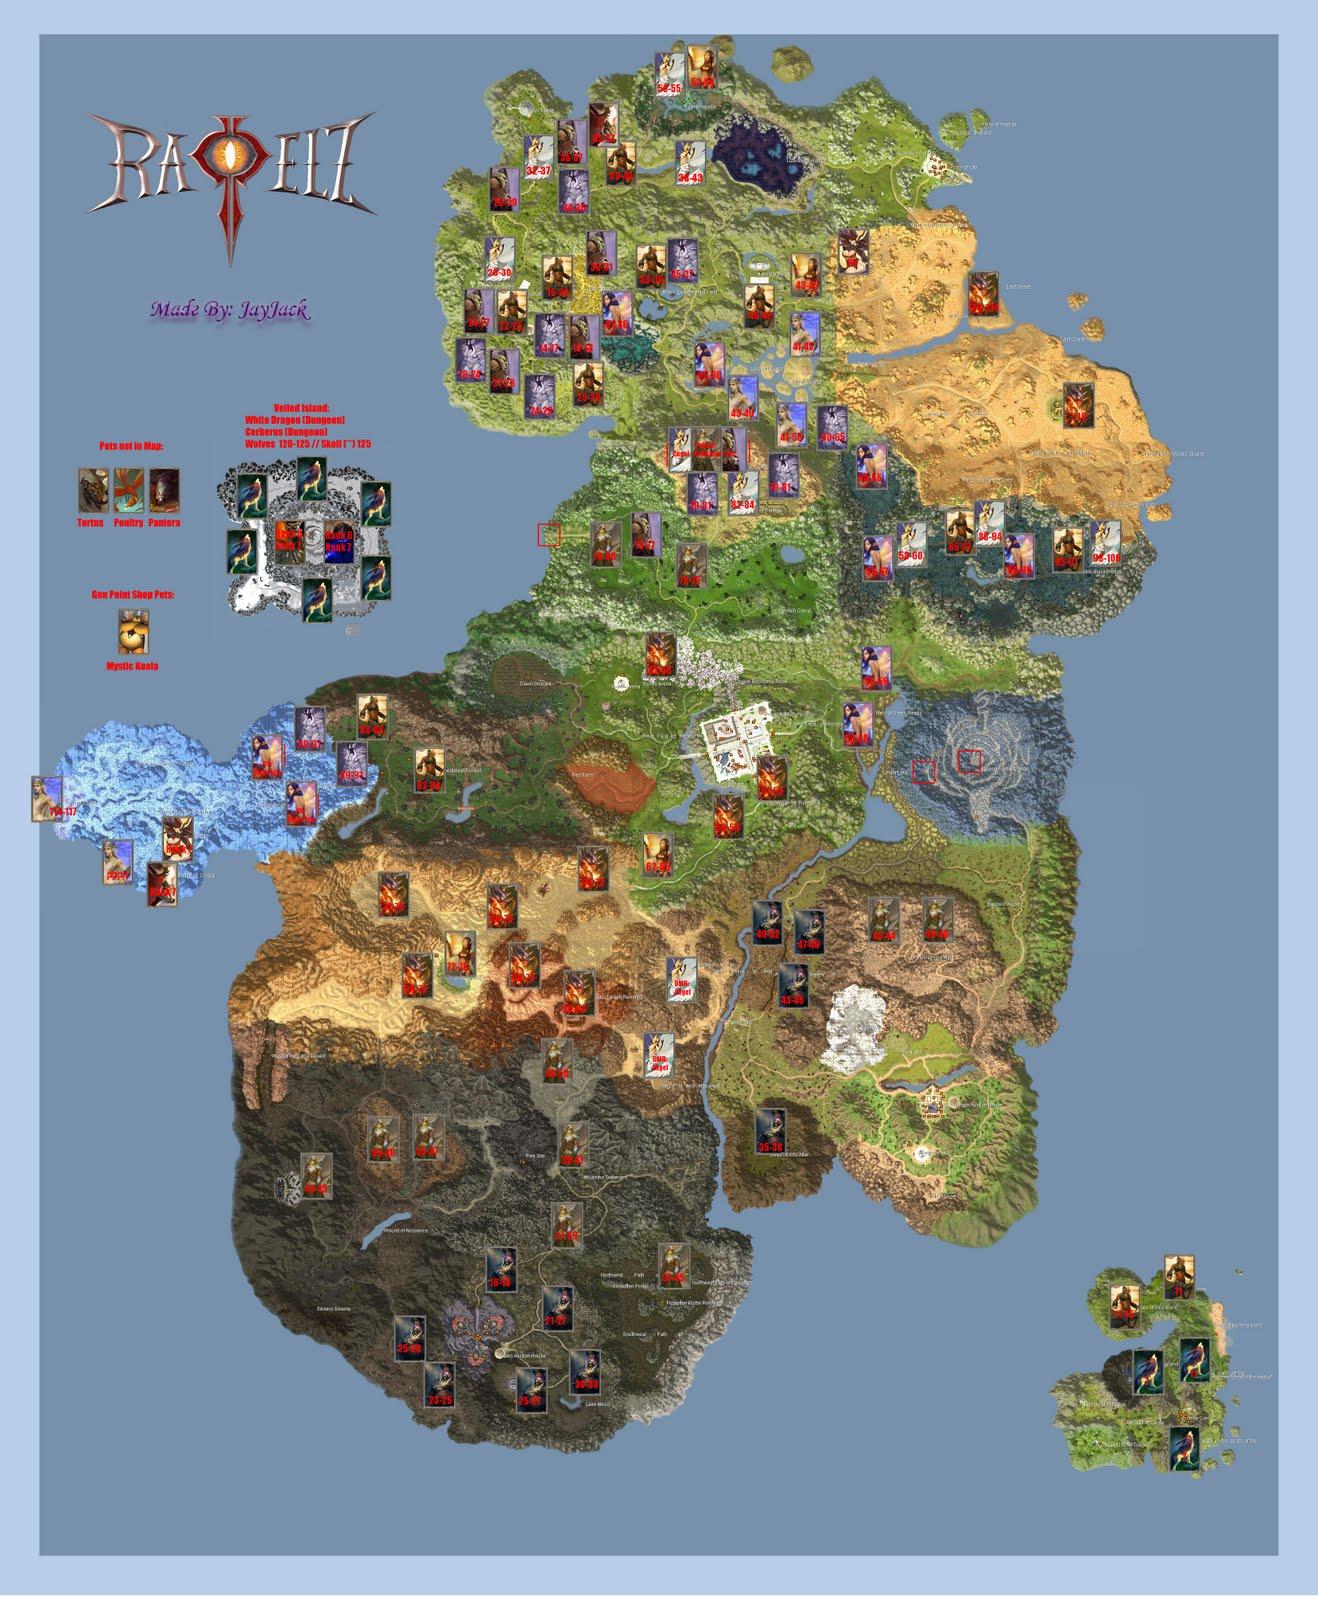 http://2.bp.blogspot.com/-GrghKRGw6c4/Tat8Oh4-e9I/AAAAAAAABS4/vhX5FmED-X4/s1600/mapaes.jpg